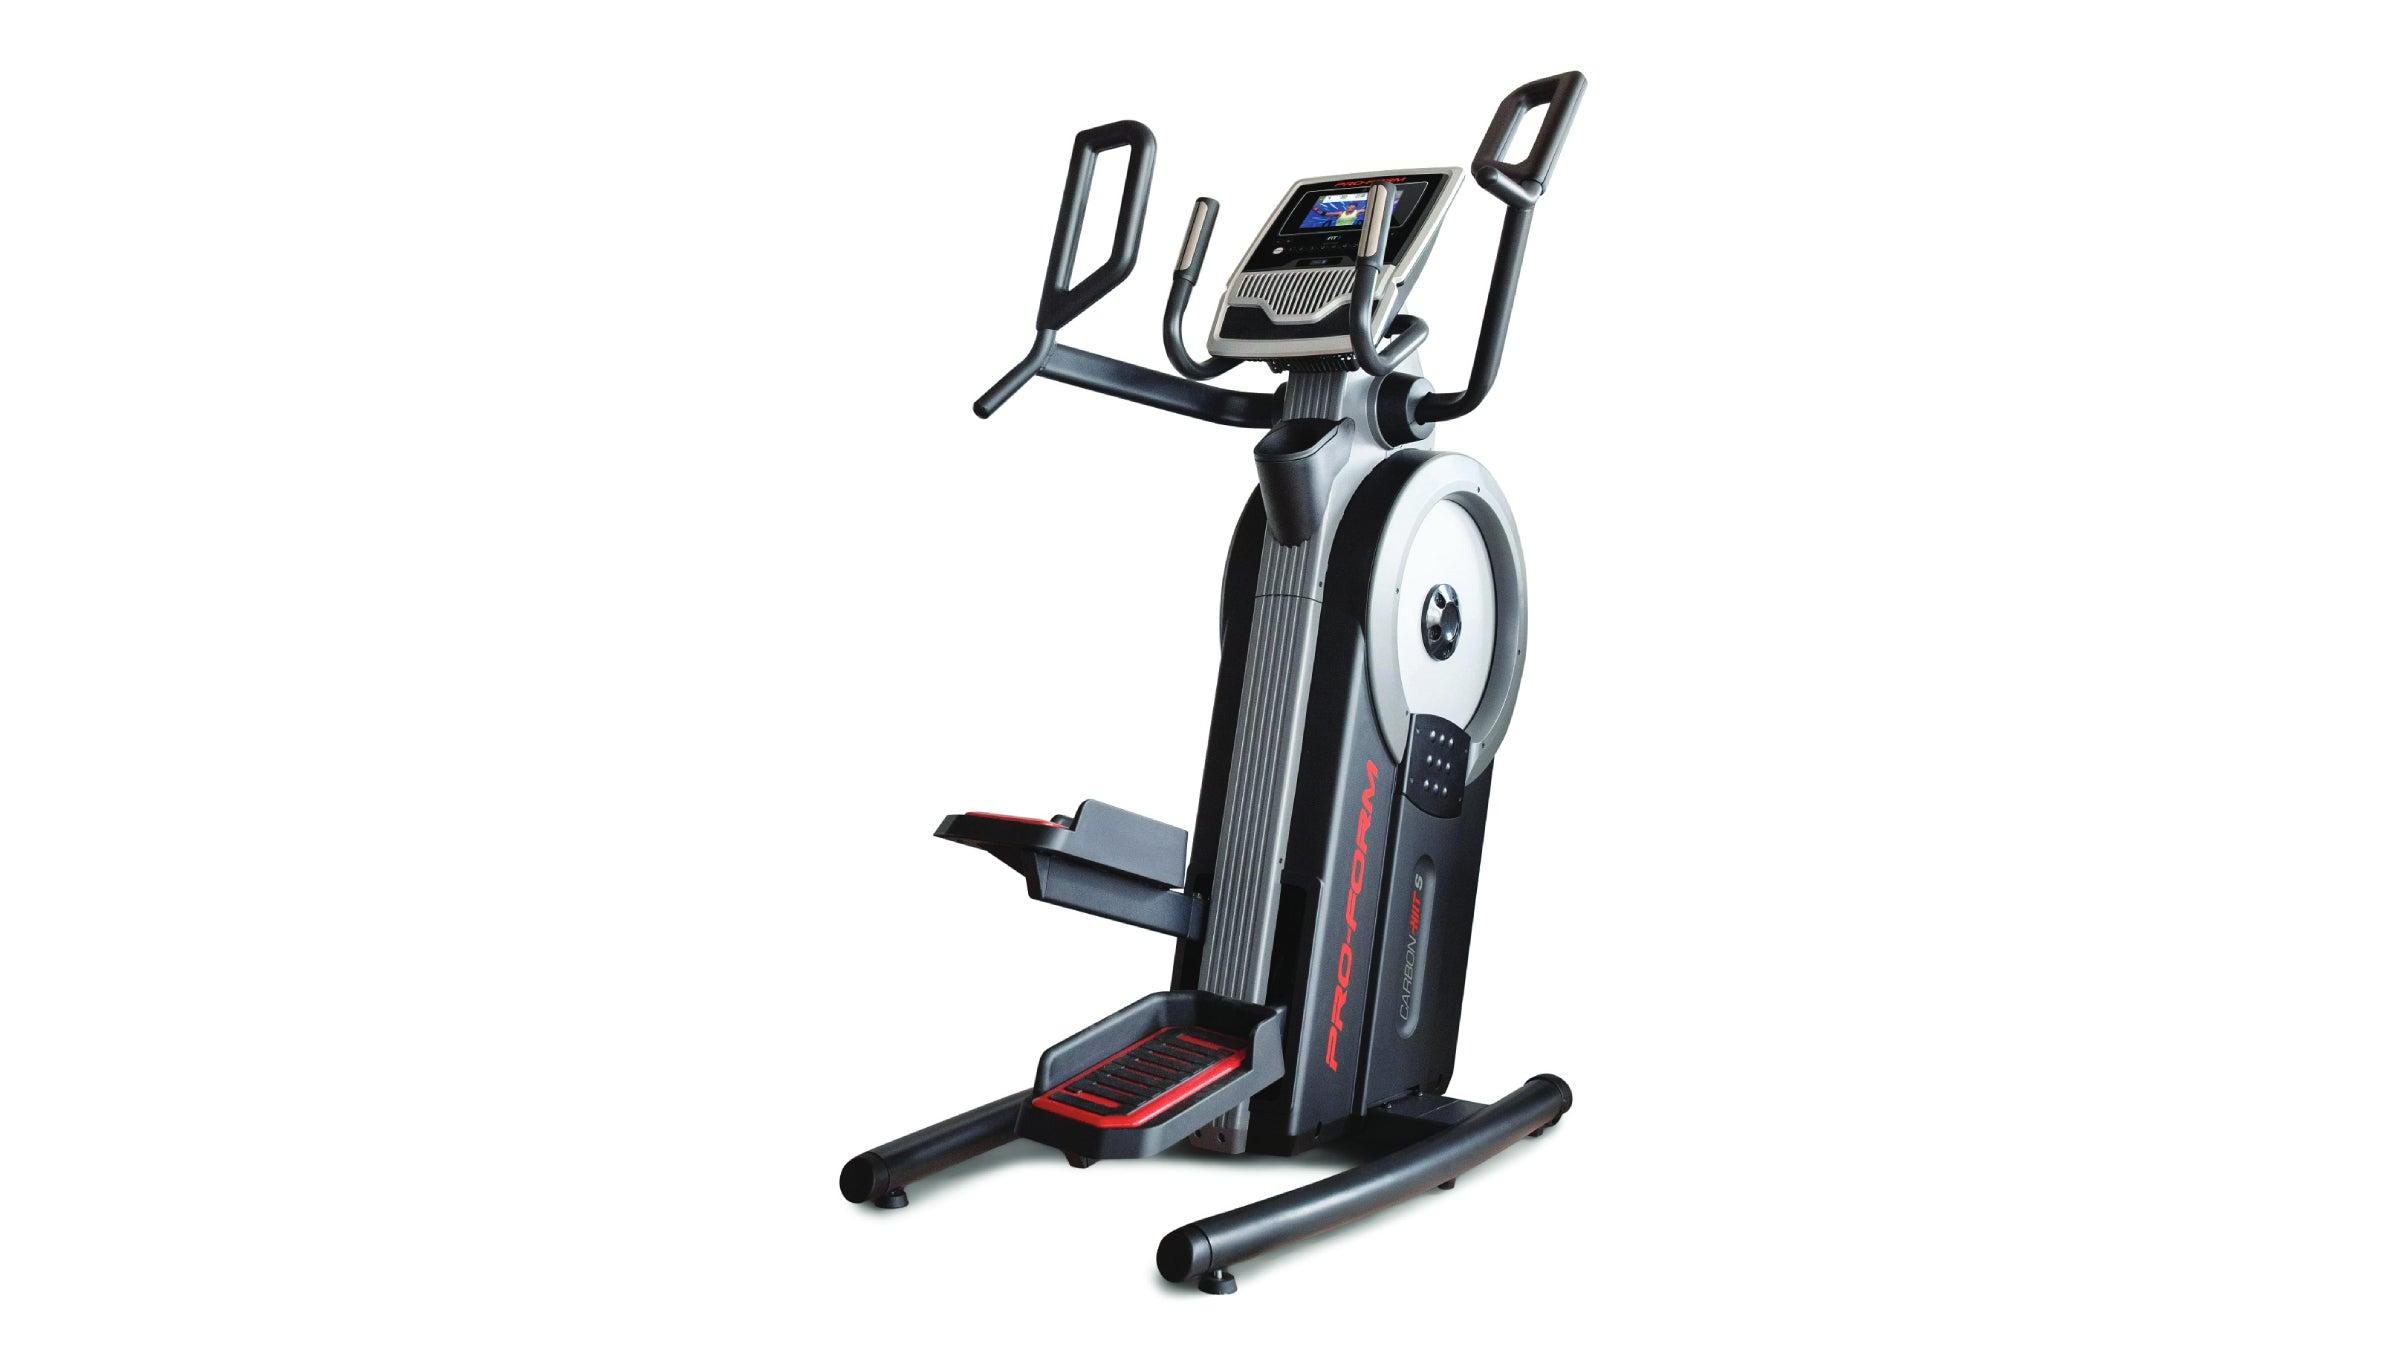 Elliptical workout machine